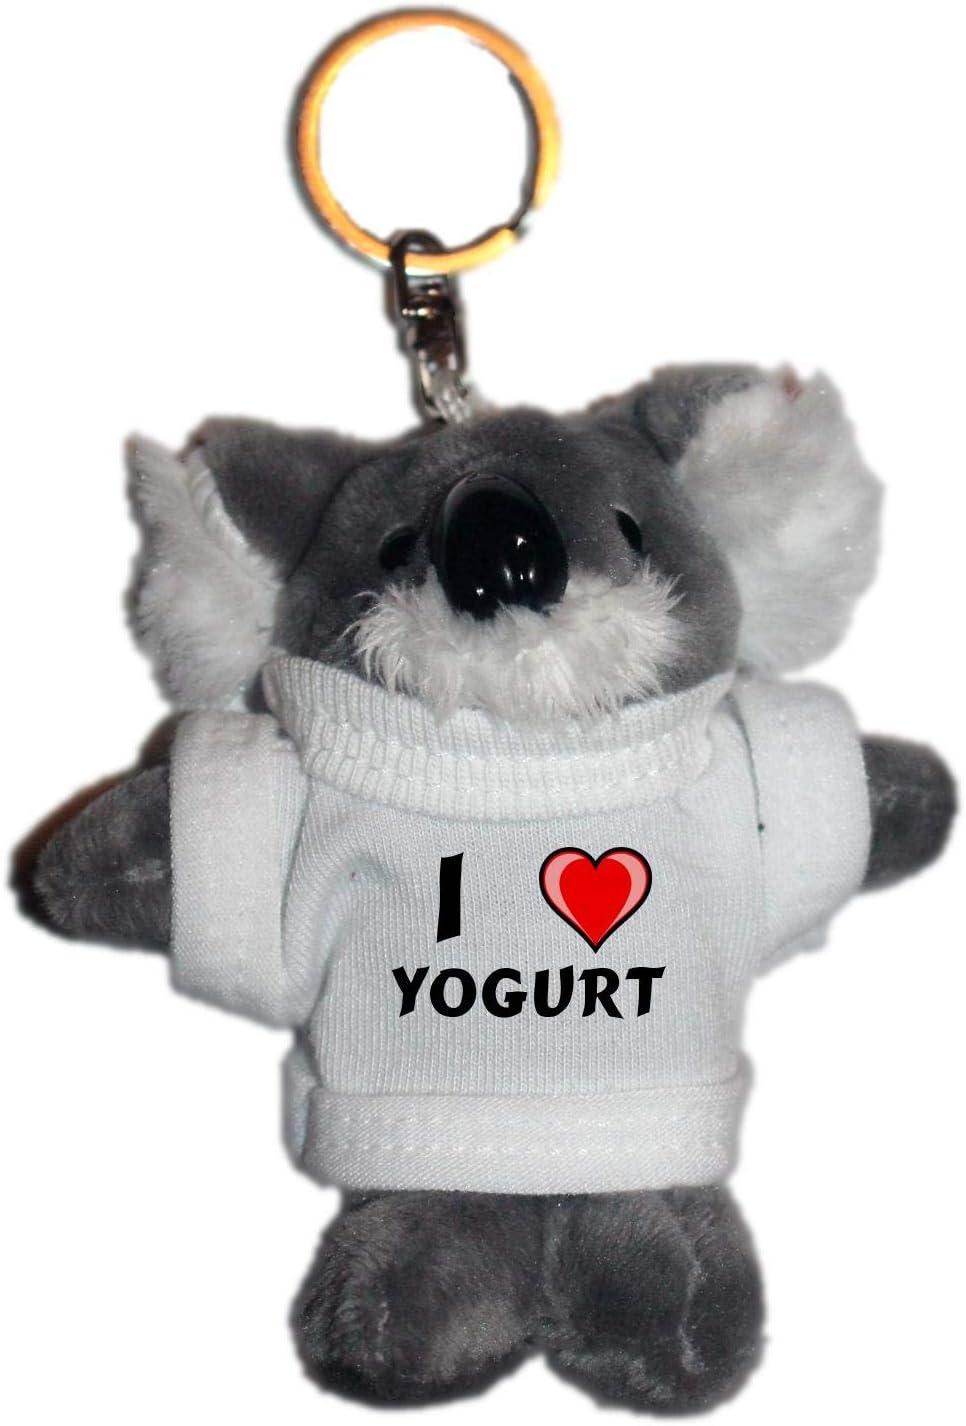 Shopzeus Coala de Peluche (Llavero) con Amo Yogurt en la Camiseta (Nombre de Pila/Apellido/Apodo)